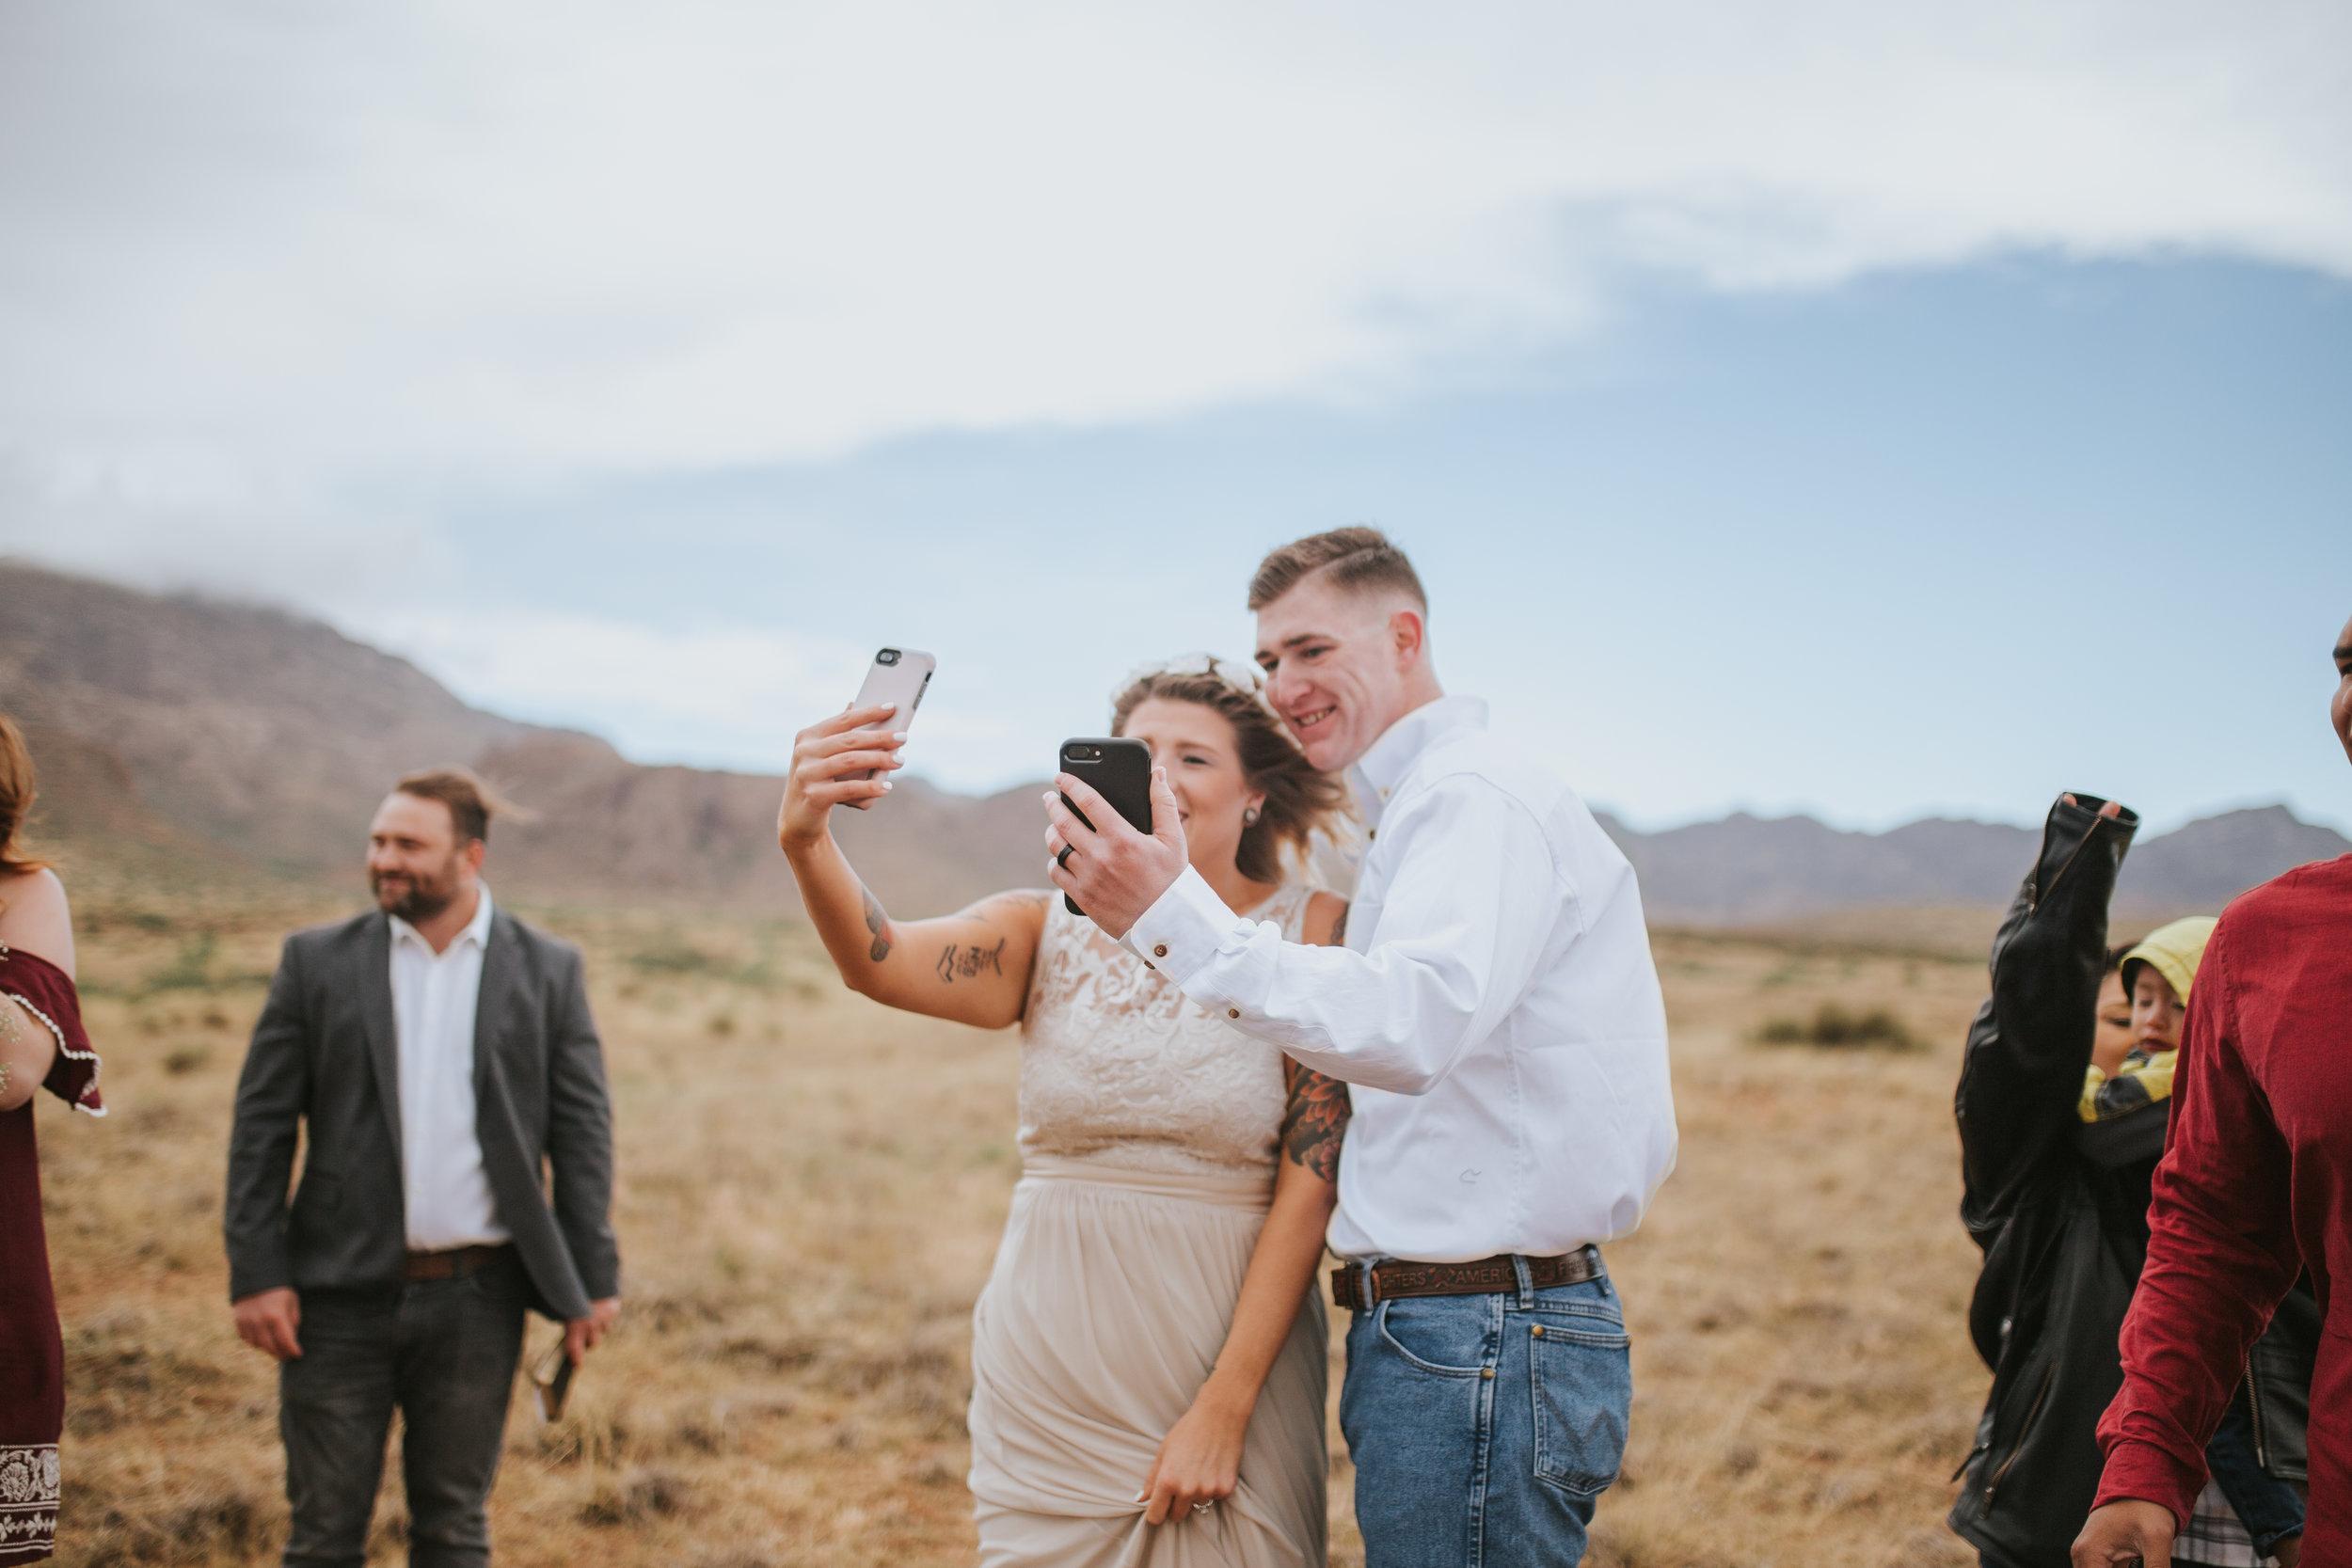 el-paso-texas-wedding-photographer-25